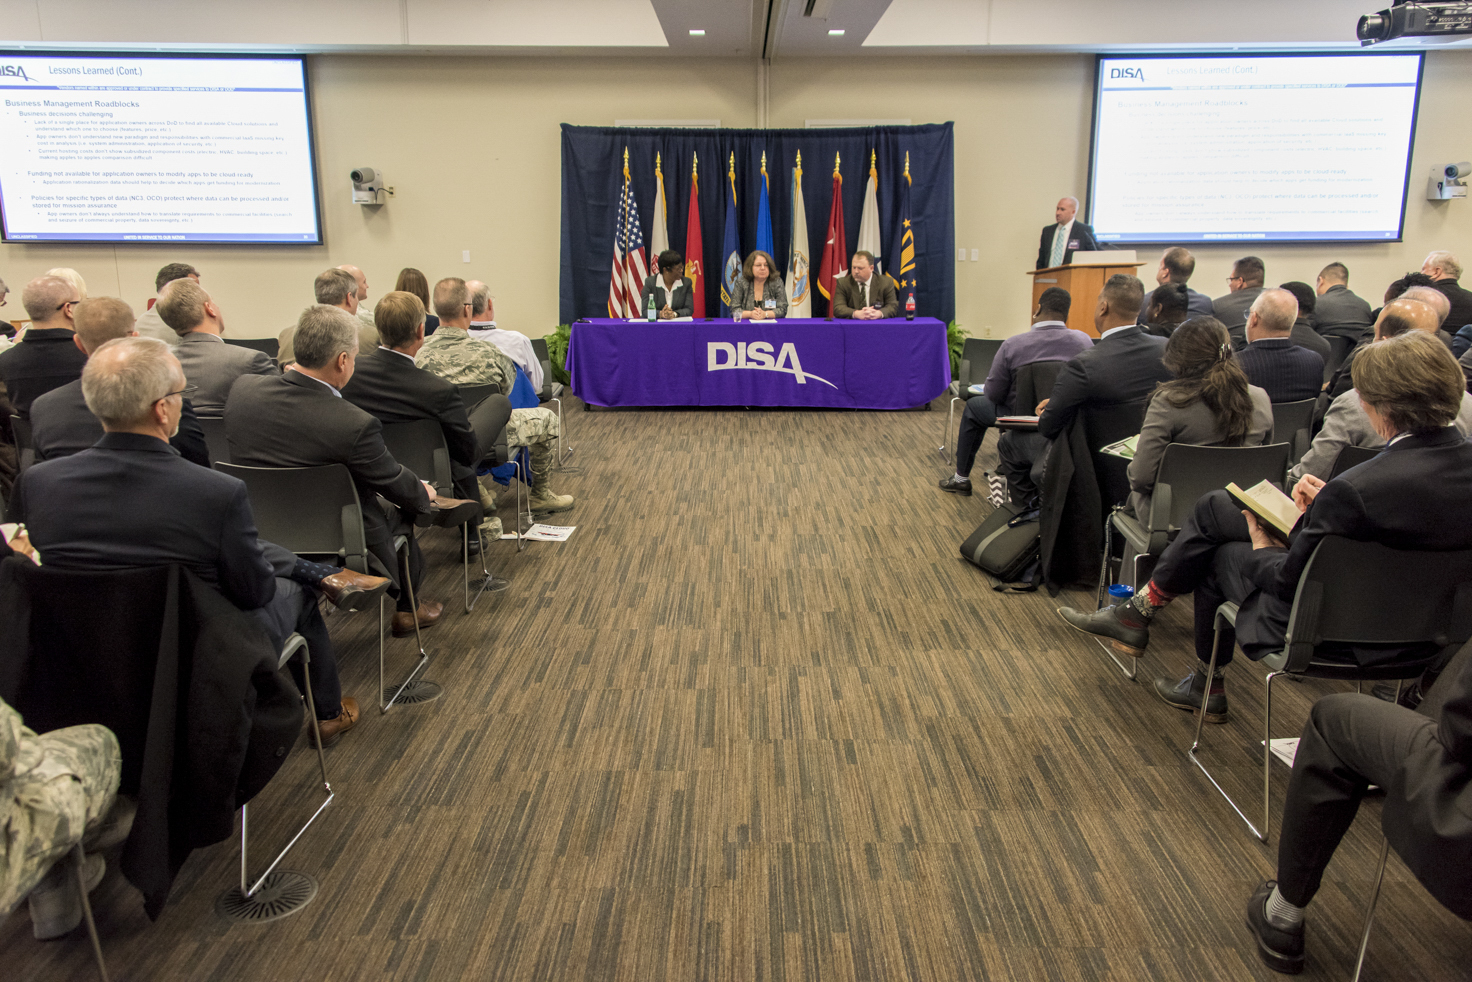 DISA Cloud Symposium